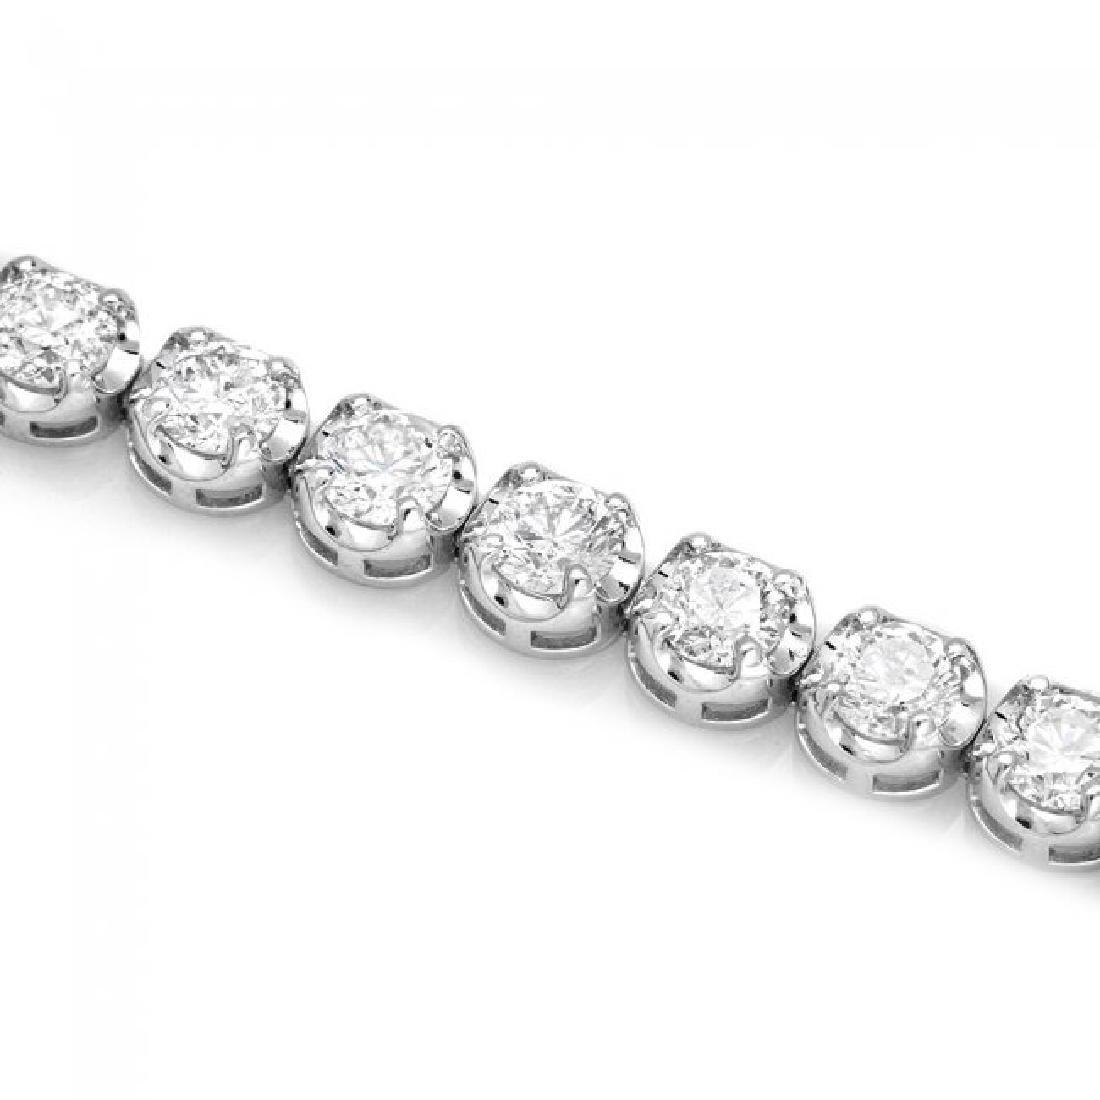 18k White Gold 9.50ct Diamond Tennis Bracelet - 3